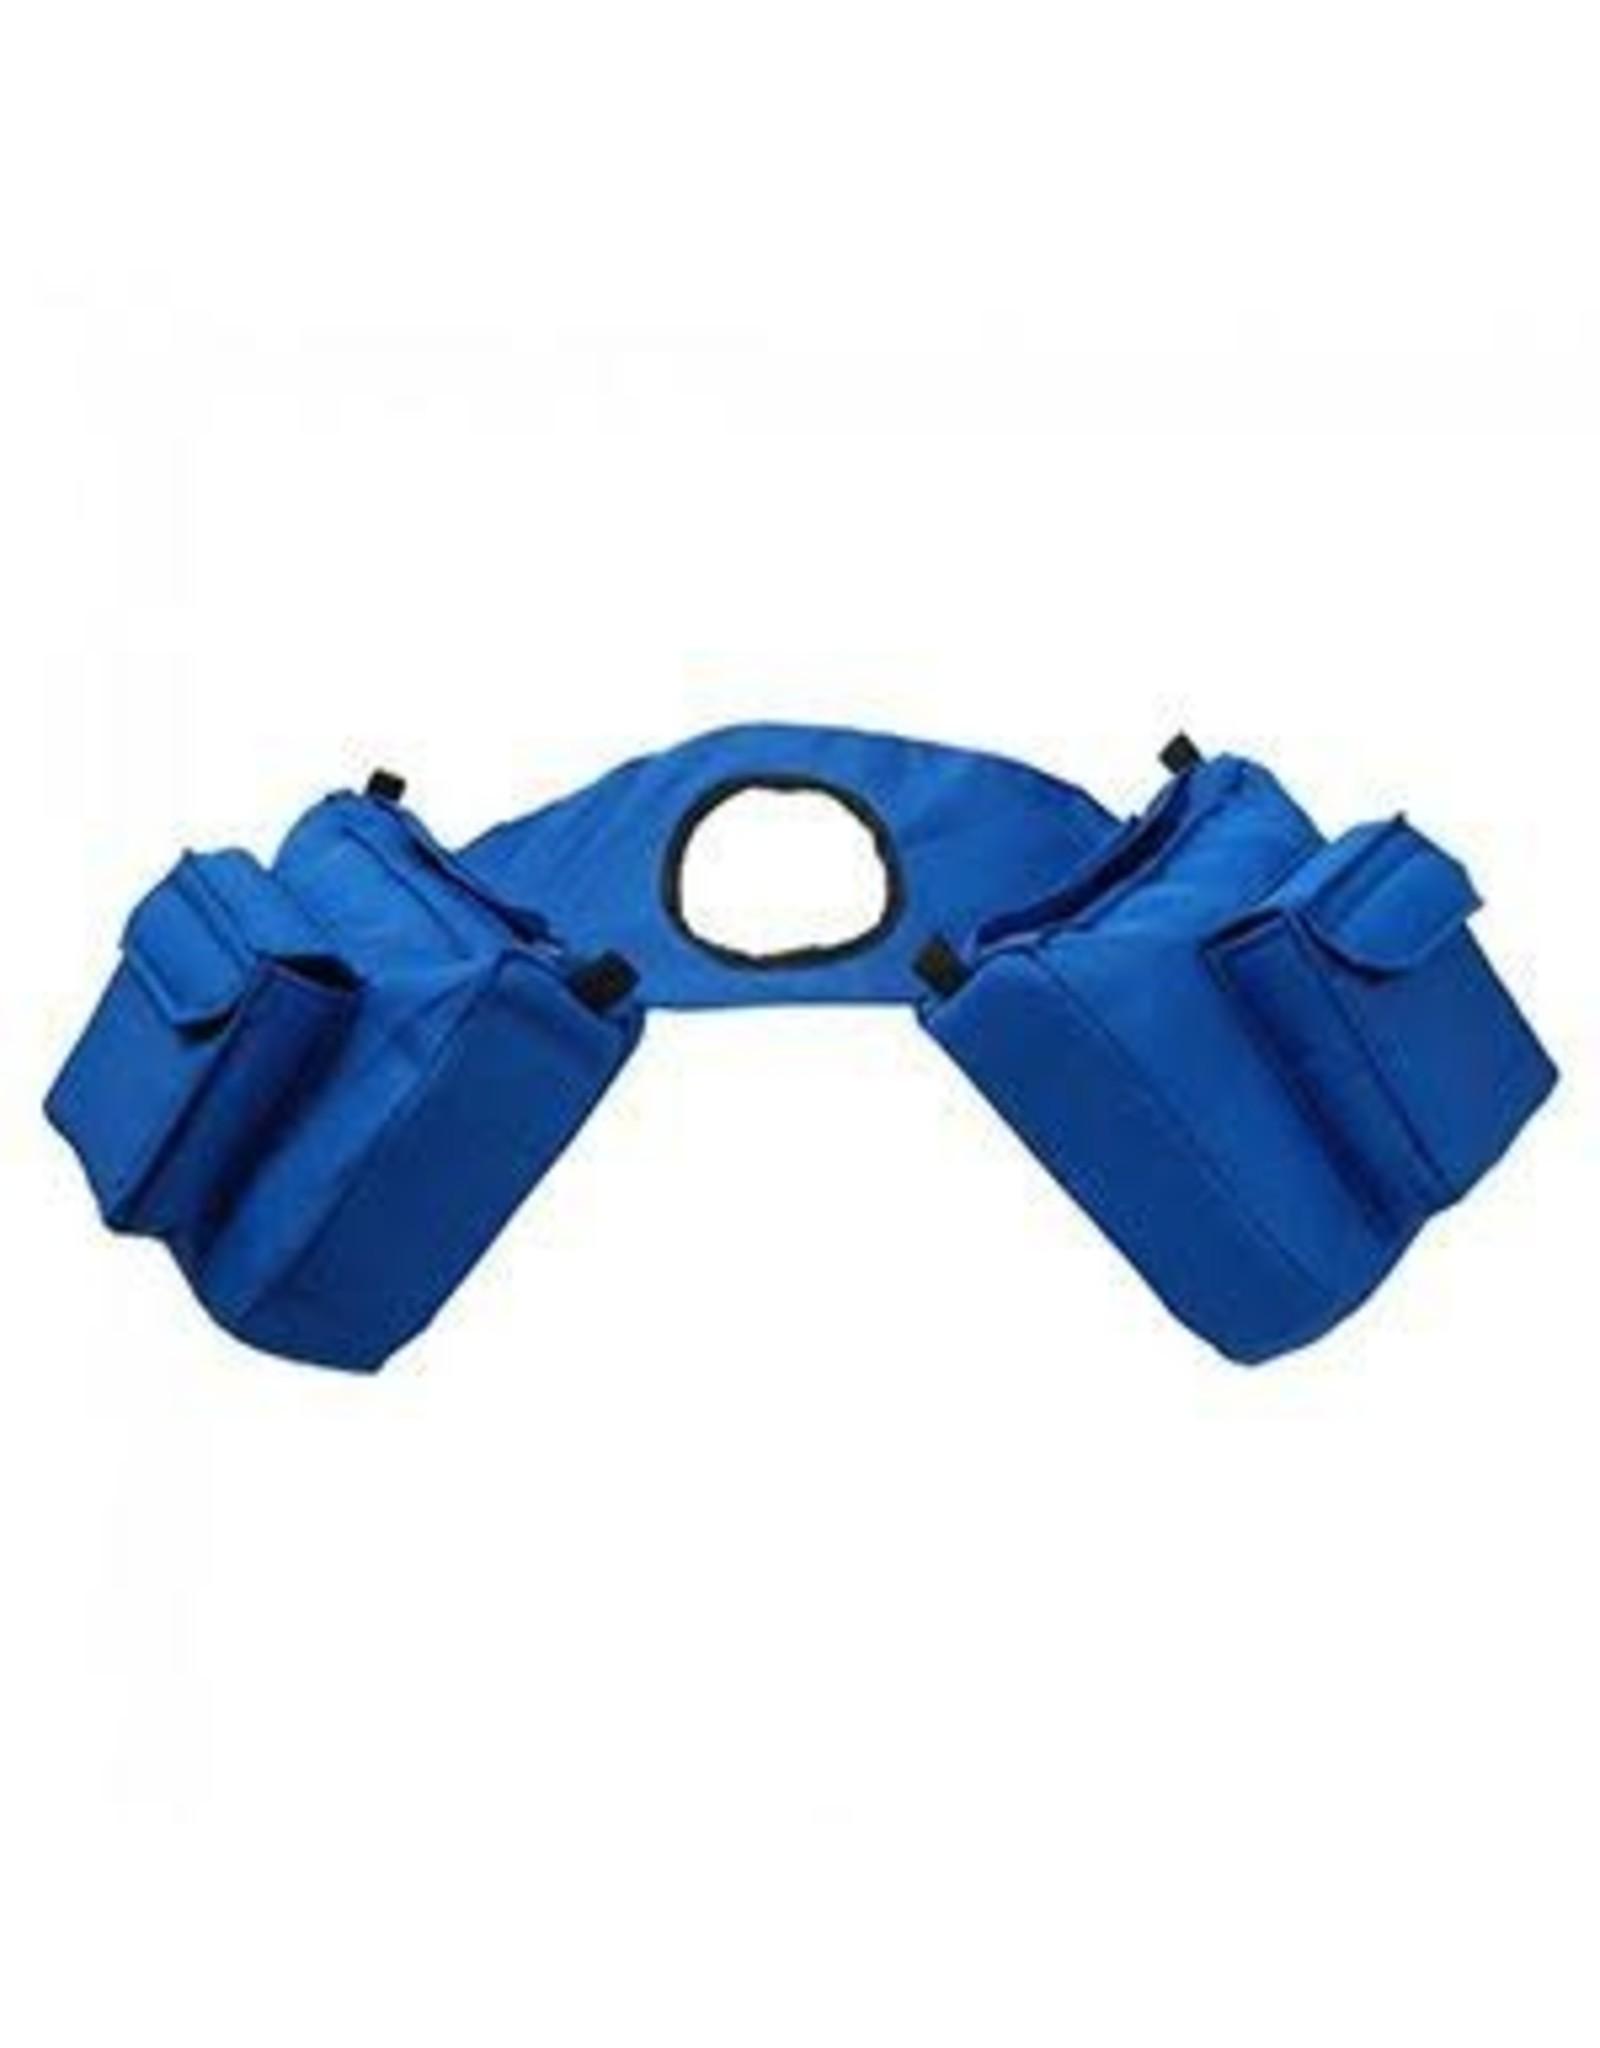 Tough One Nylon Horn Bag